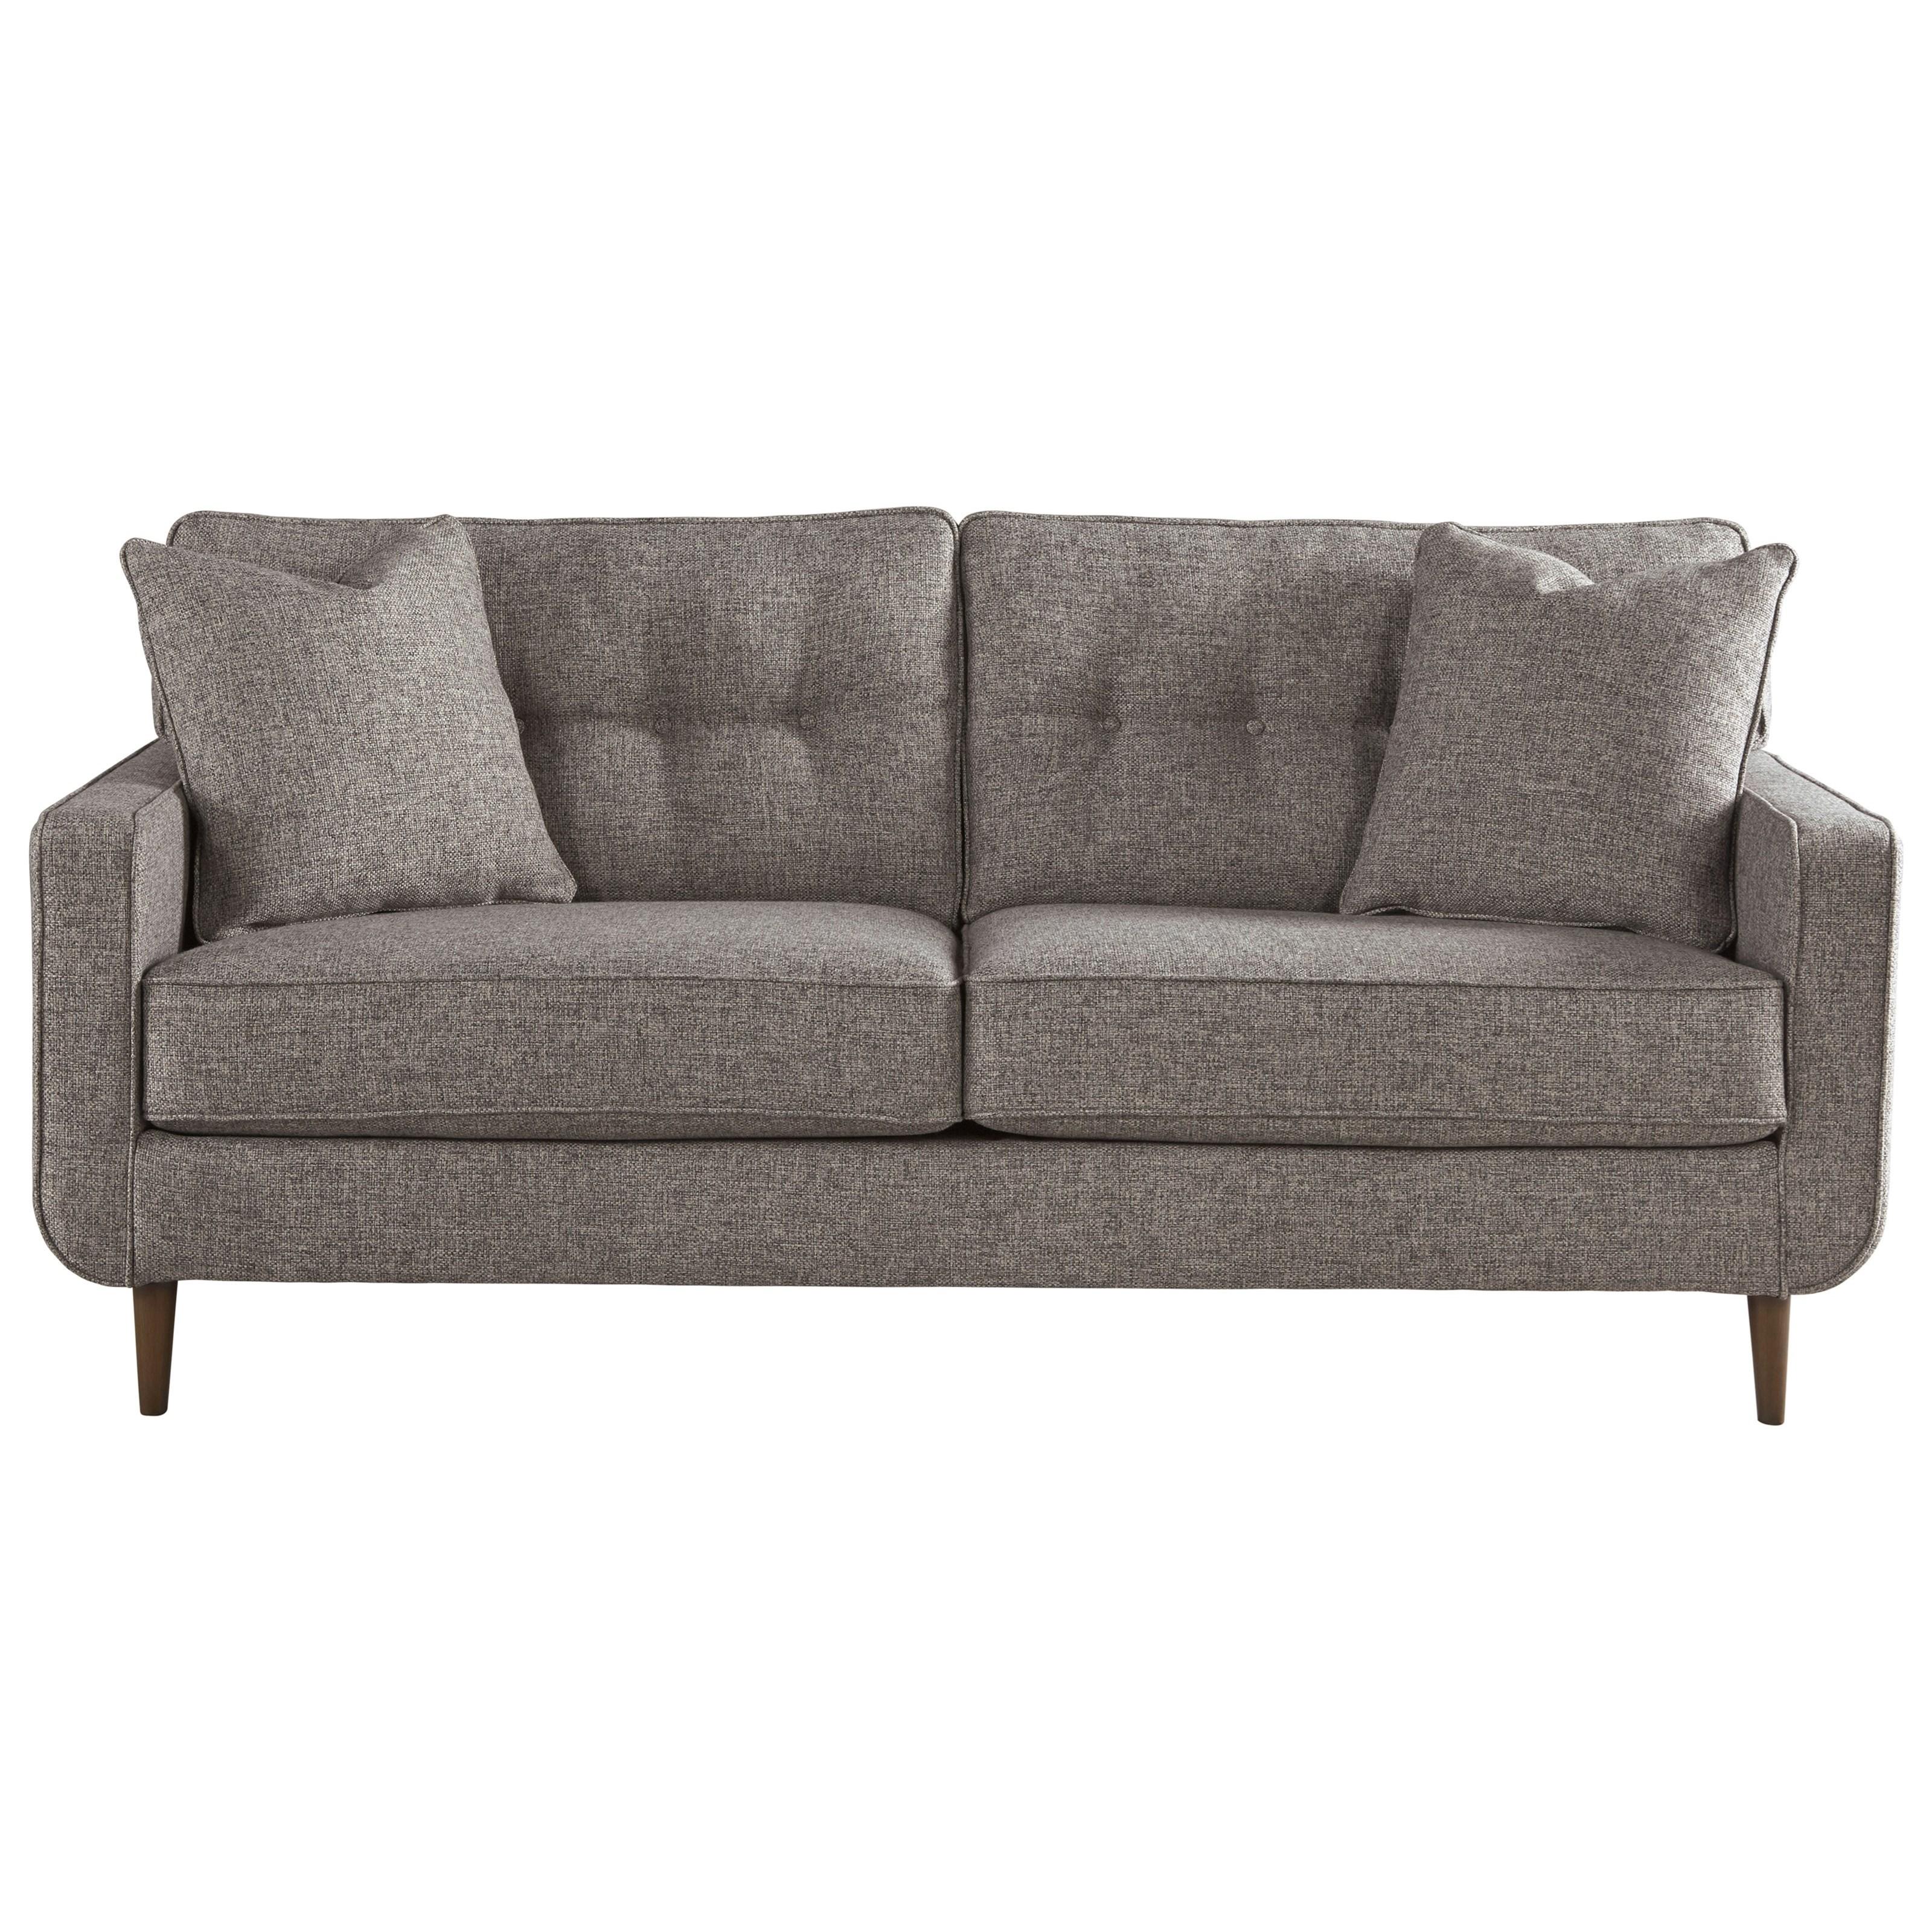 ashley furniture modern sofa simmons columbia stone reclining reviews zardoni mid century olinde s